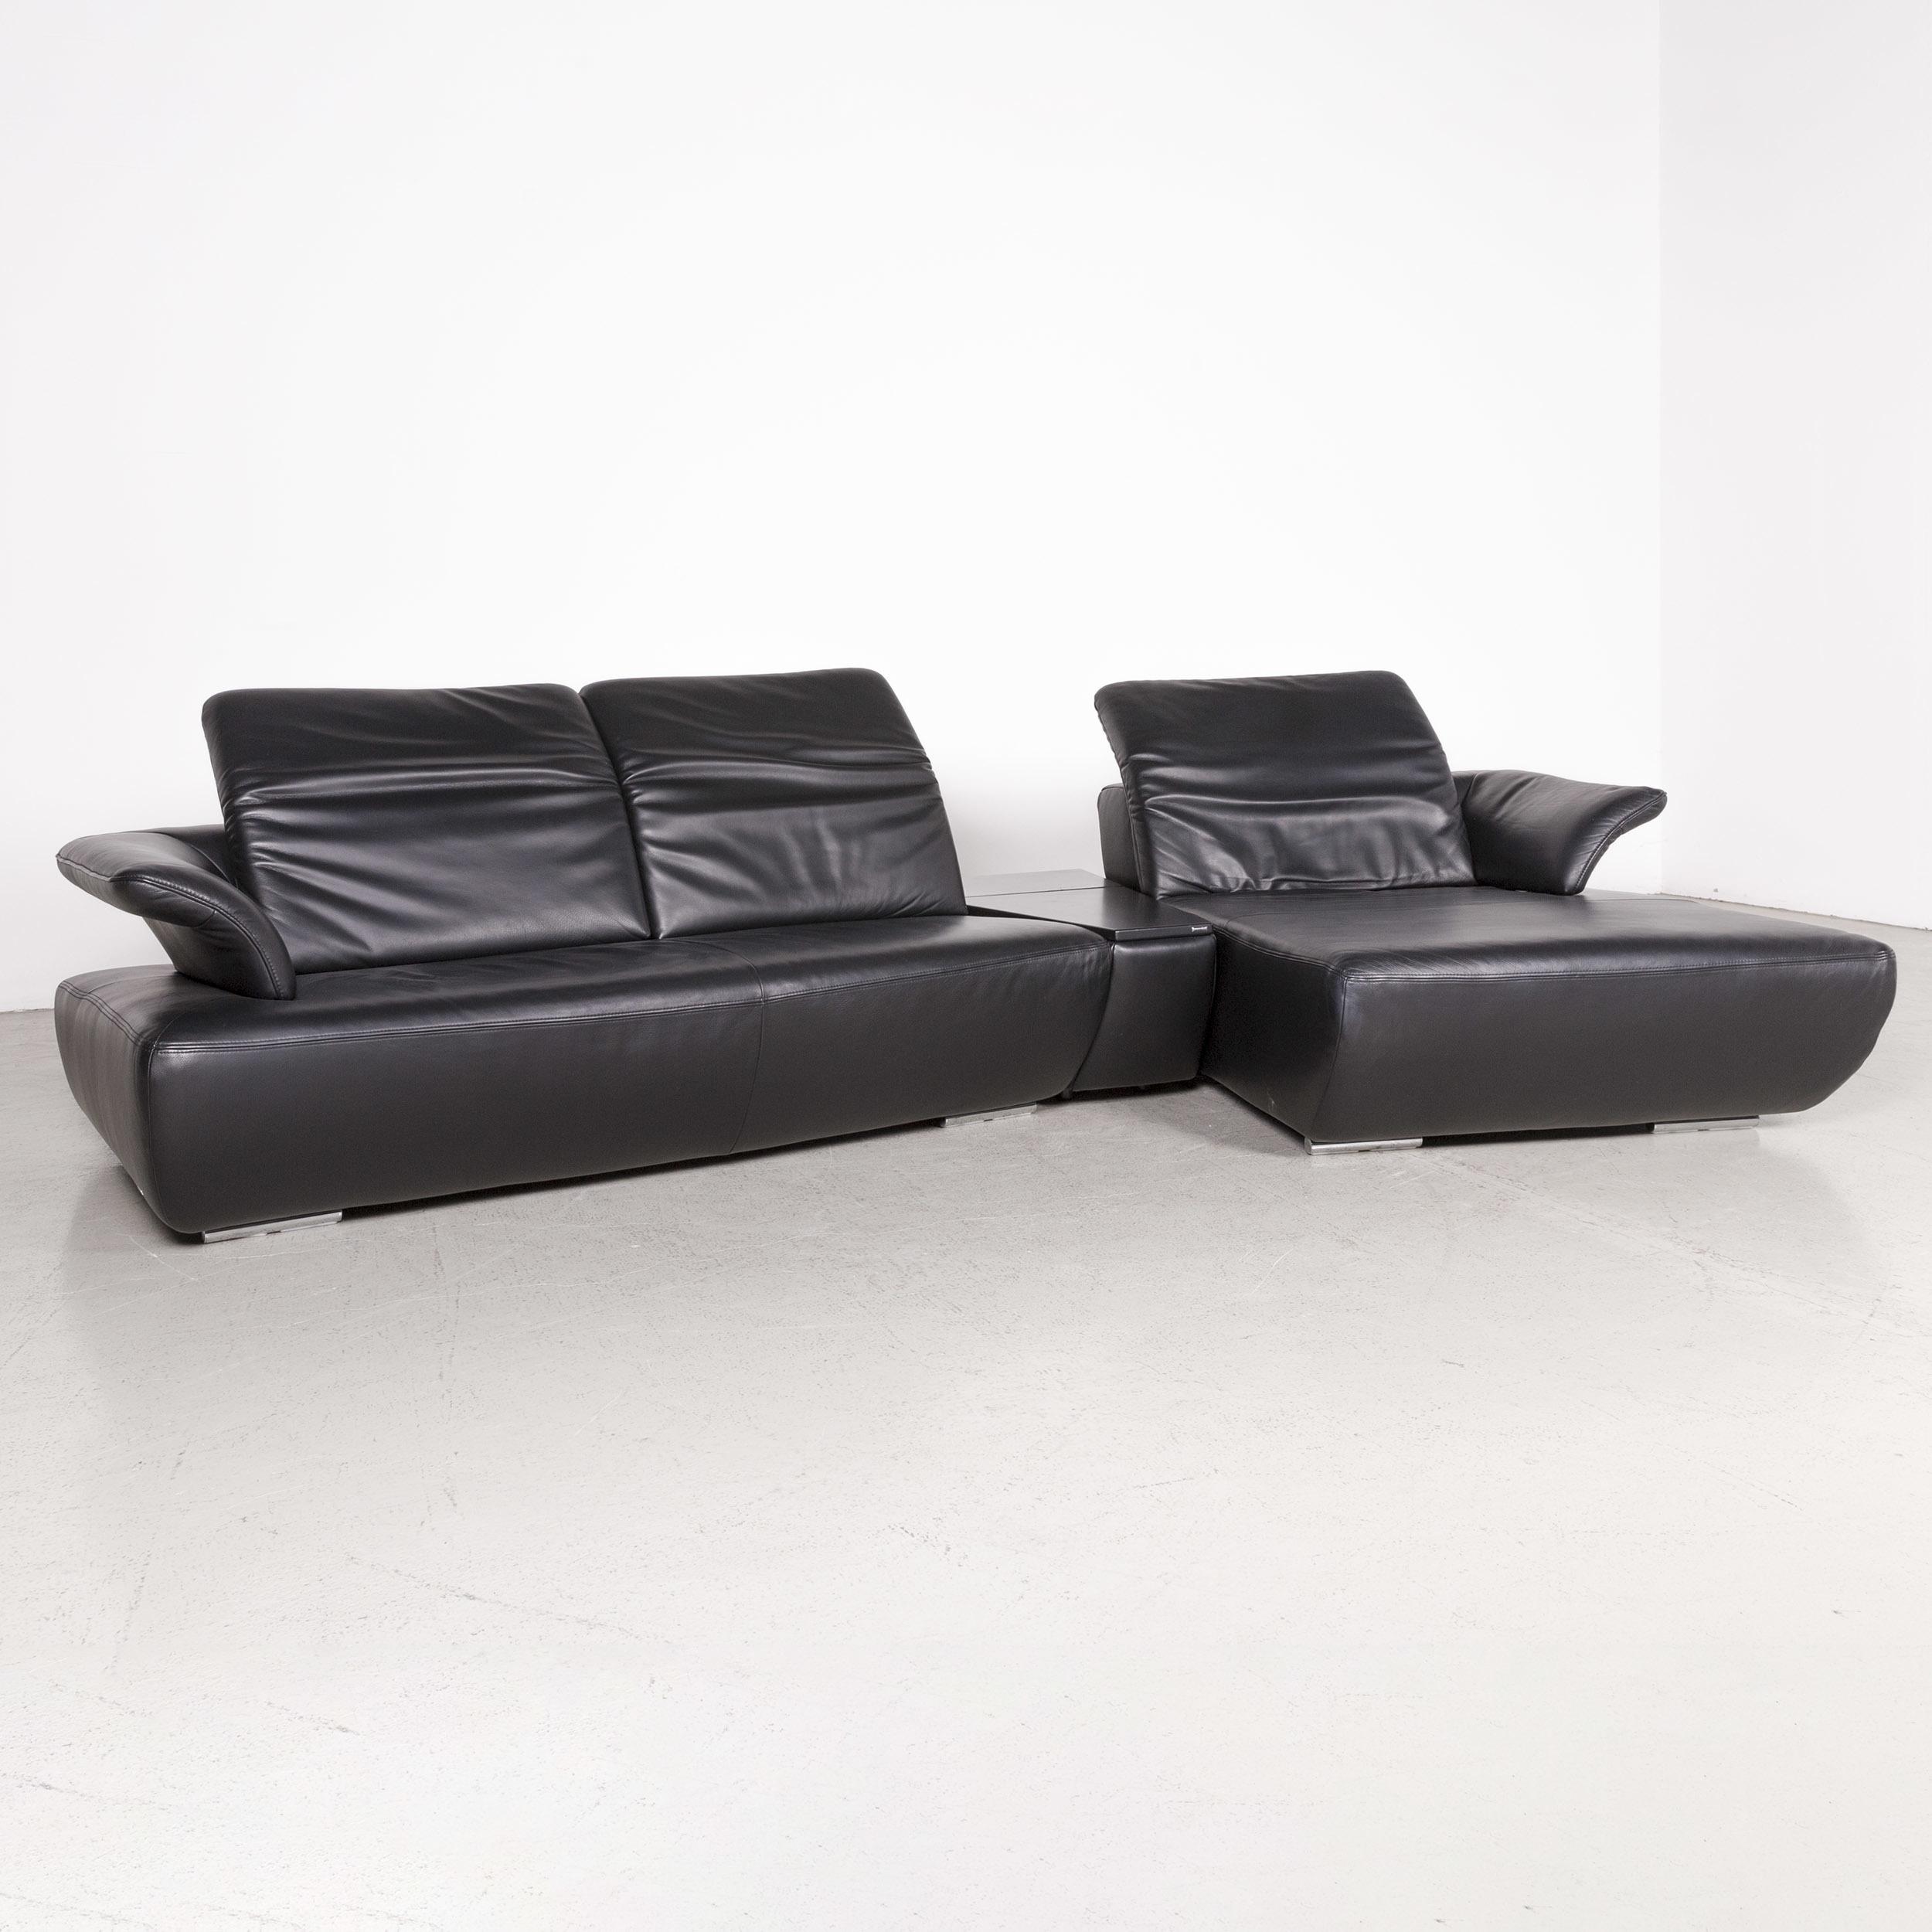 Koinor Avanti Designer Leather Corner Sofa Black Genuine